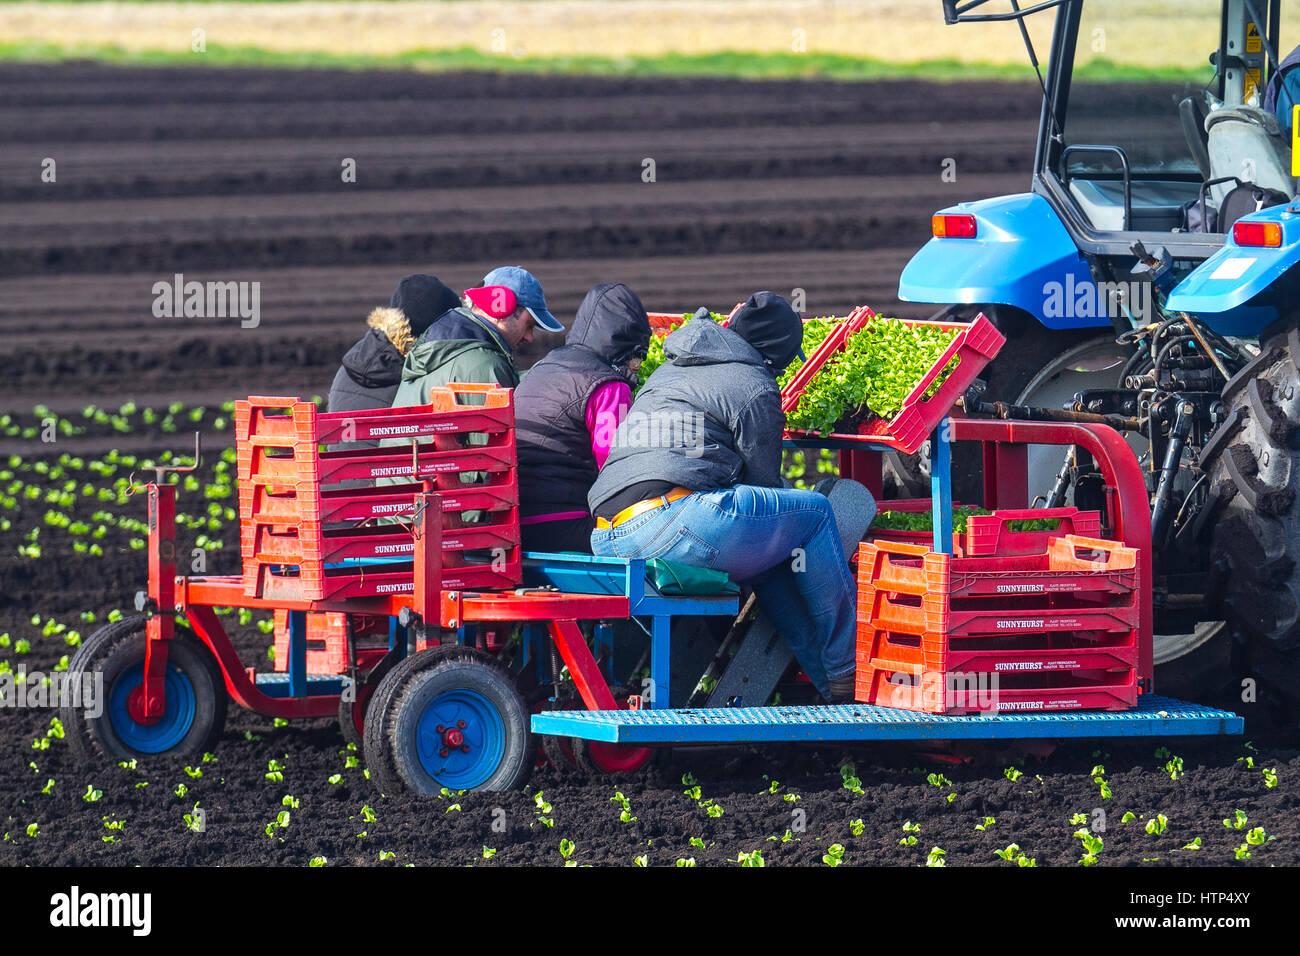 Tarleton, Lancashire, UK. UK Weather. 14th March, 2017 EU Nationals Spring planting lettuce in warming soils. The - Stock Image